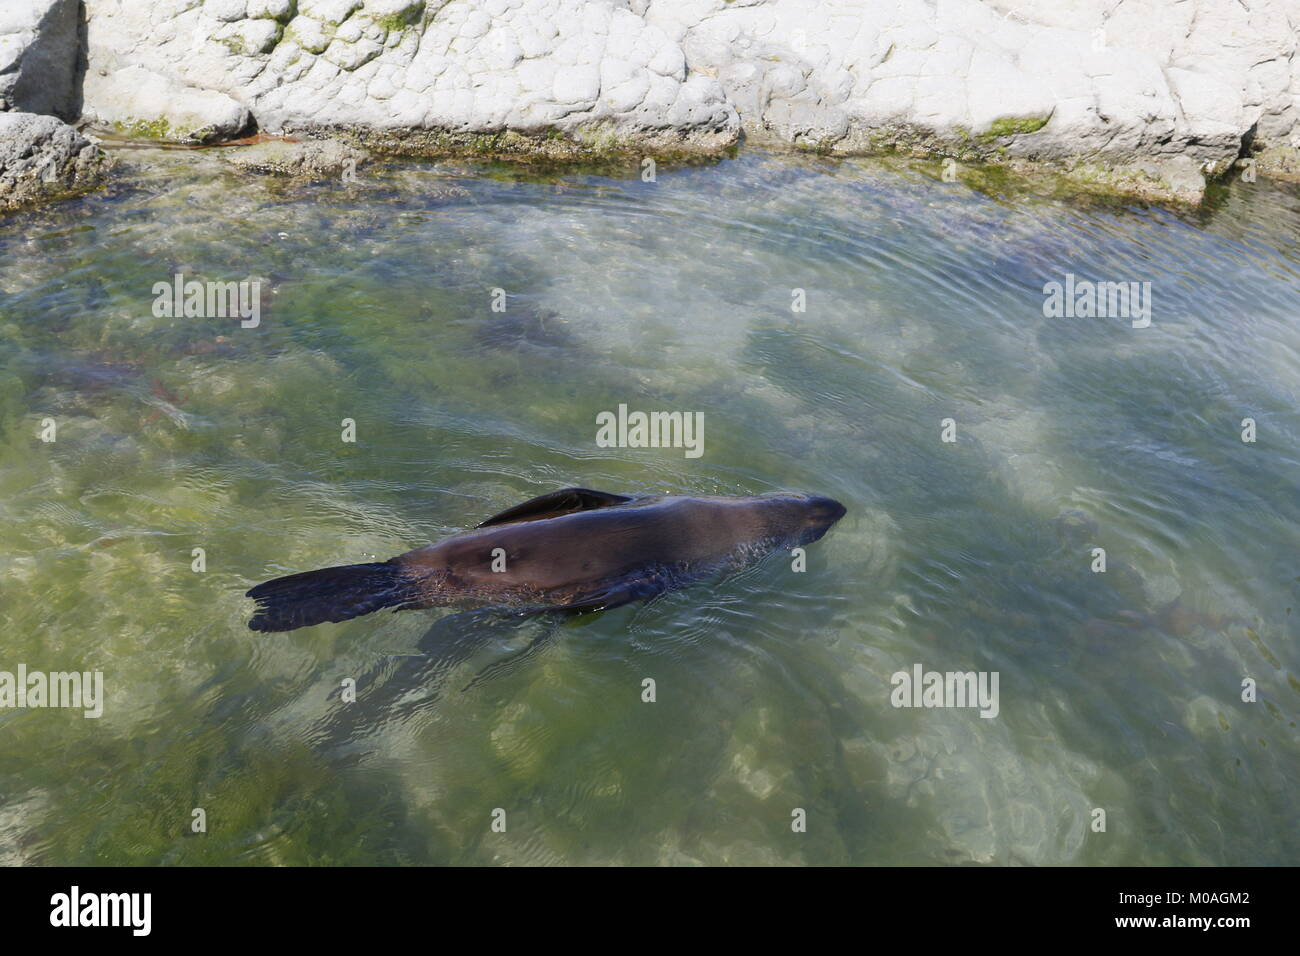 Australasian Fur Sea (New Zealand Fur Seal)l, Arctocephalus forsteri, swimming upside down at Kaikoura - Stock Image